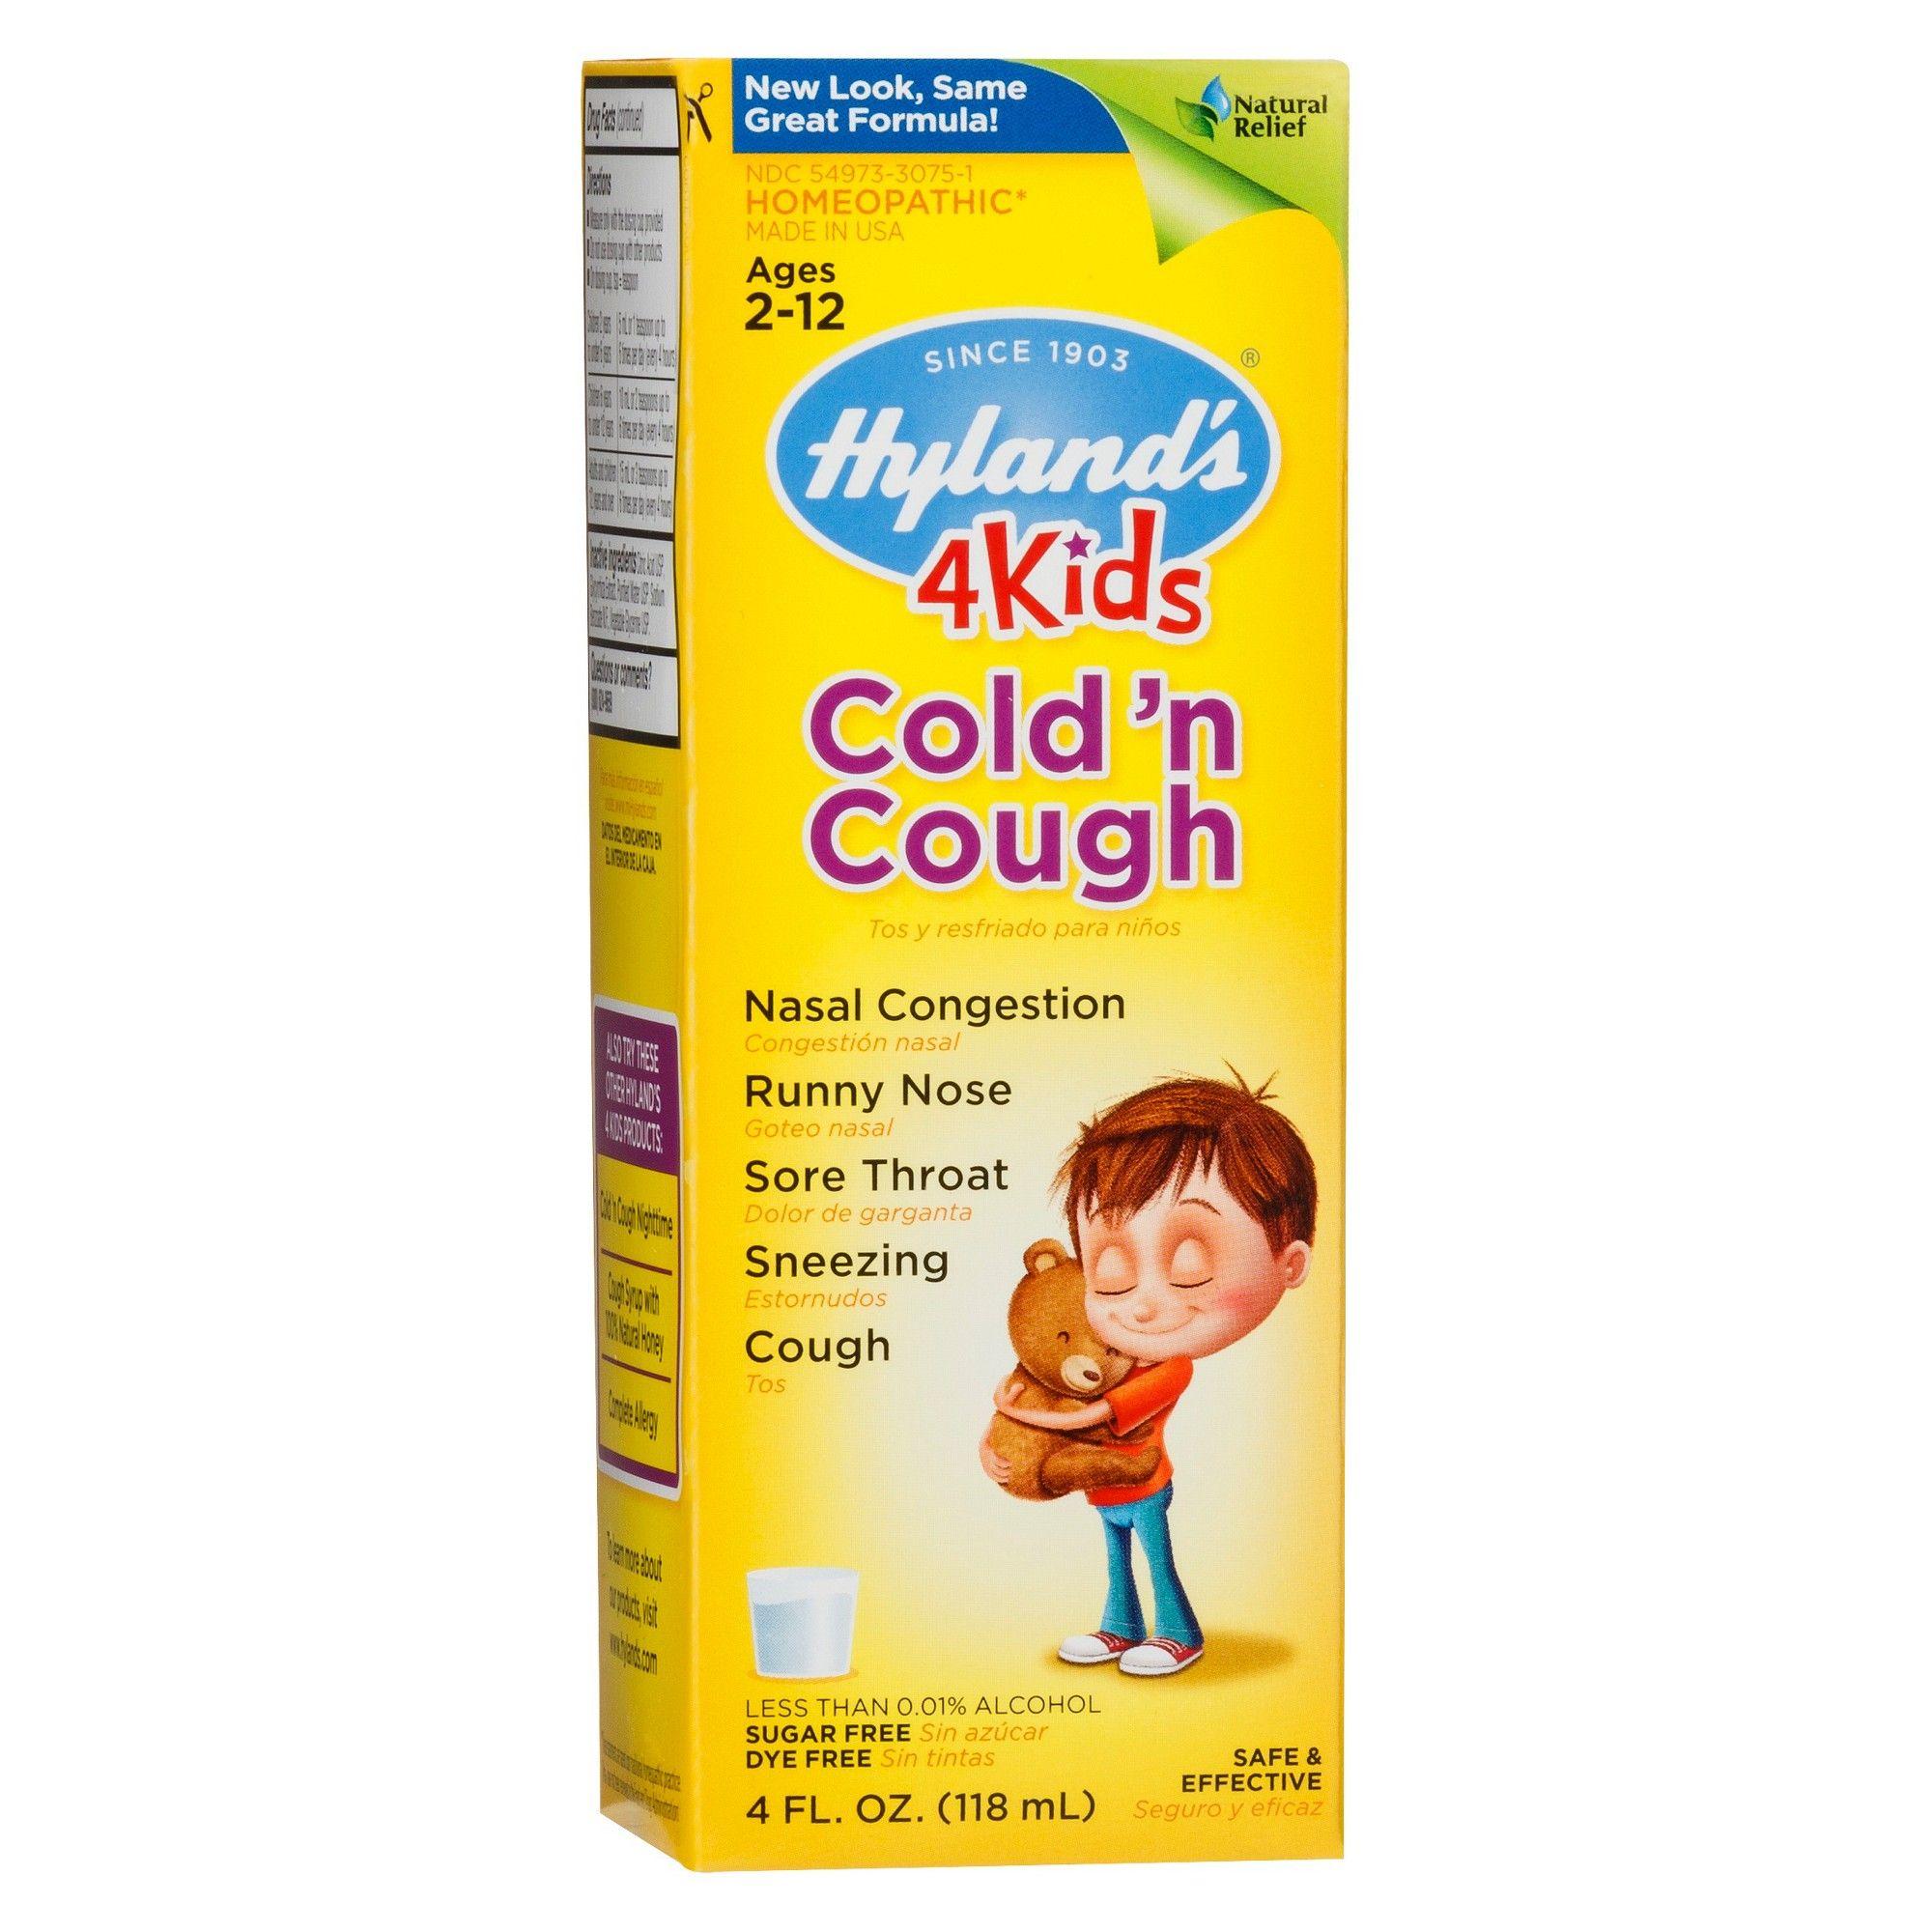 Children's Hyland's Cold 'n Cough 4 Kids Syrup 4 fl oz